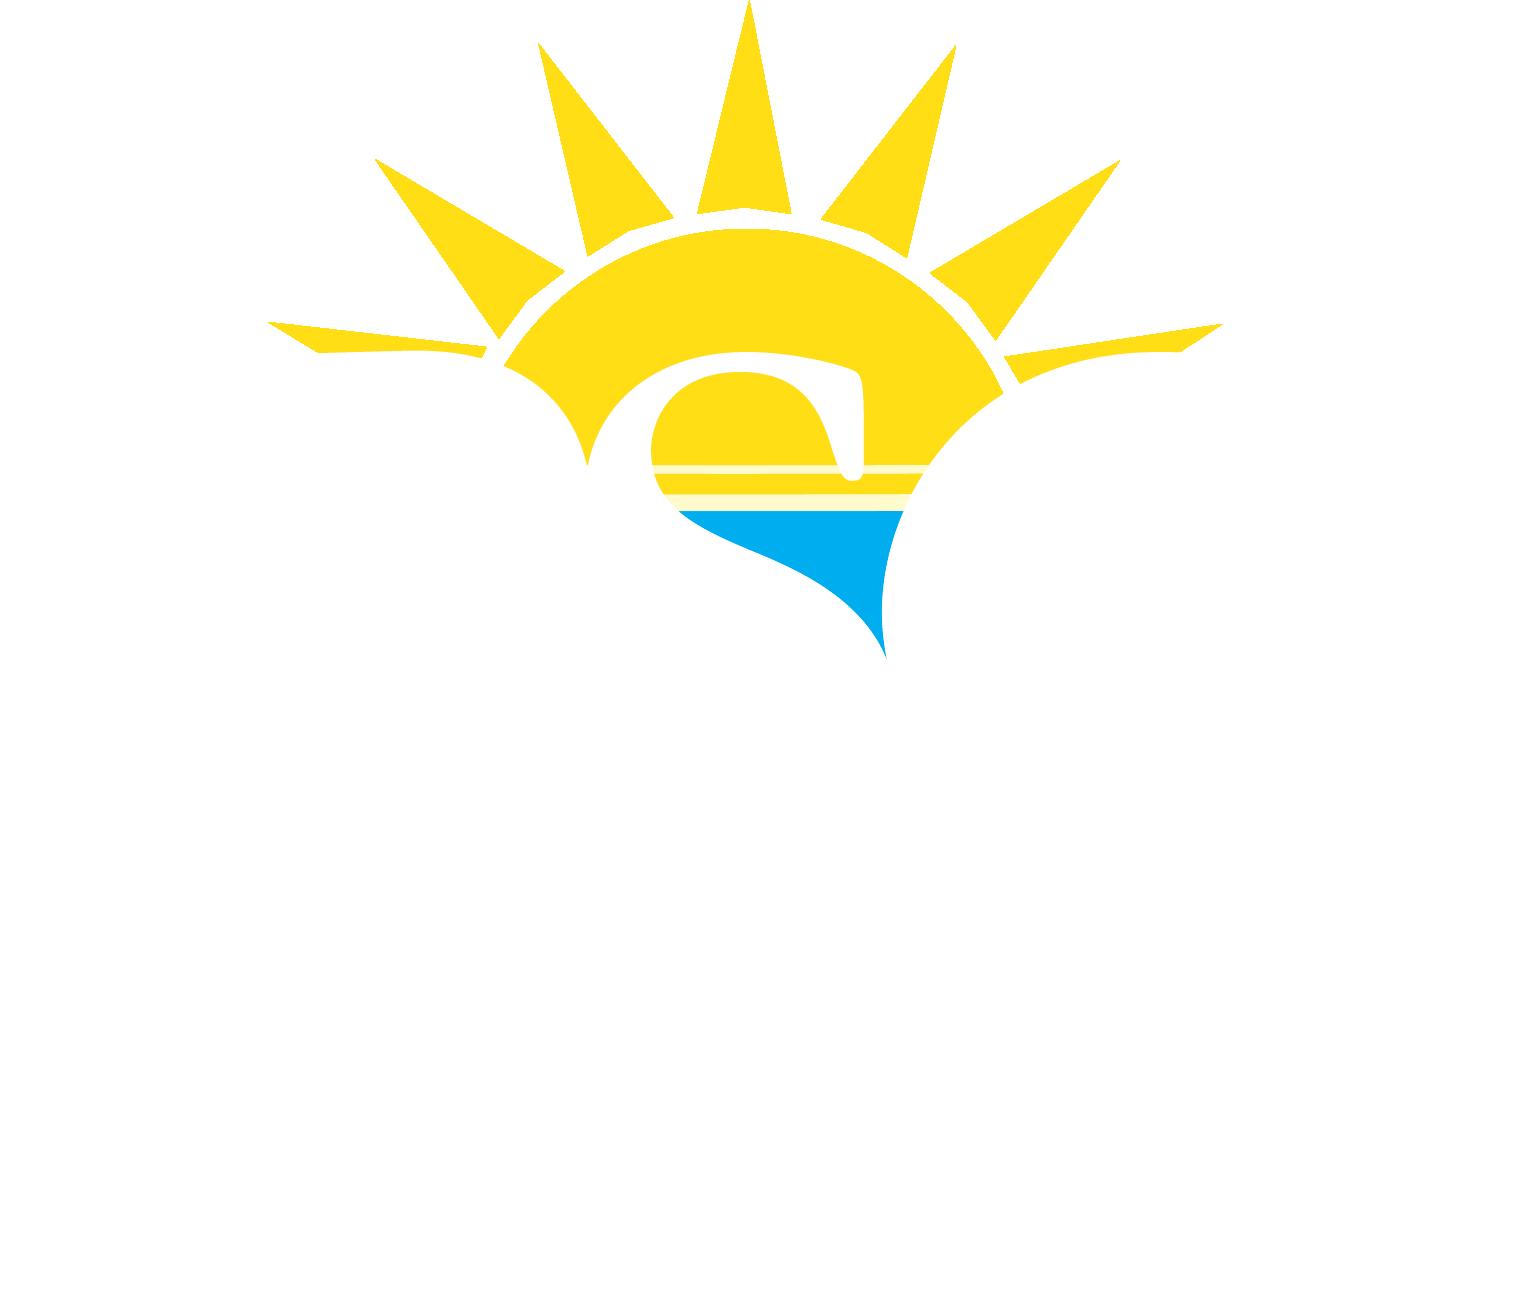 decorative image of PSC_VertLogo2_KO_CMYK_btytou , Branding 2016-09-08 20:26:58